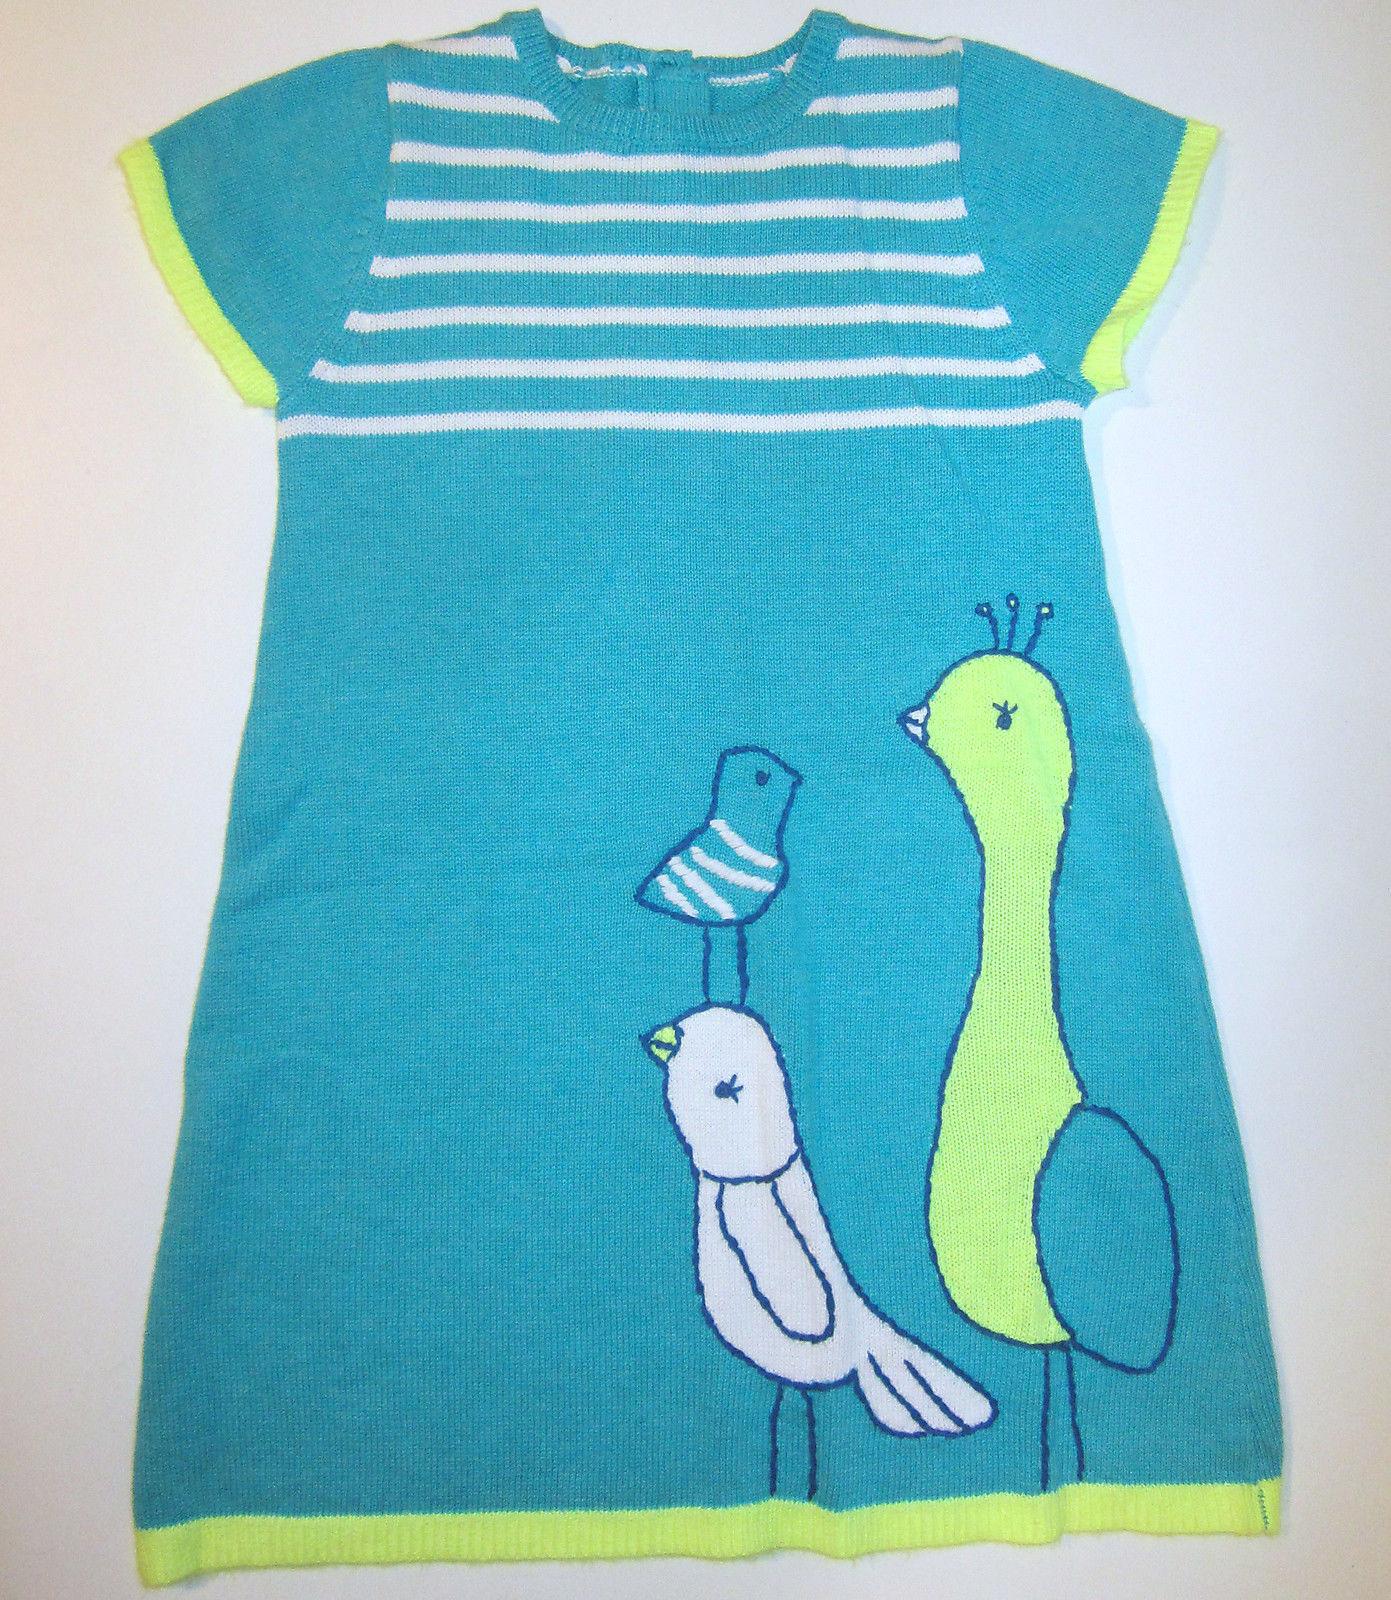 1718e2263b1 Gymboree Birds Sweater Dress girl s 2T and 11 similar items. S l1600